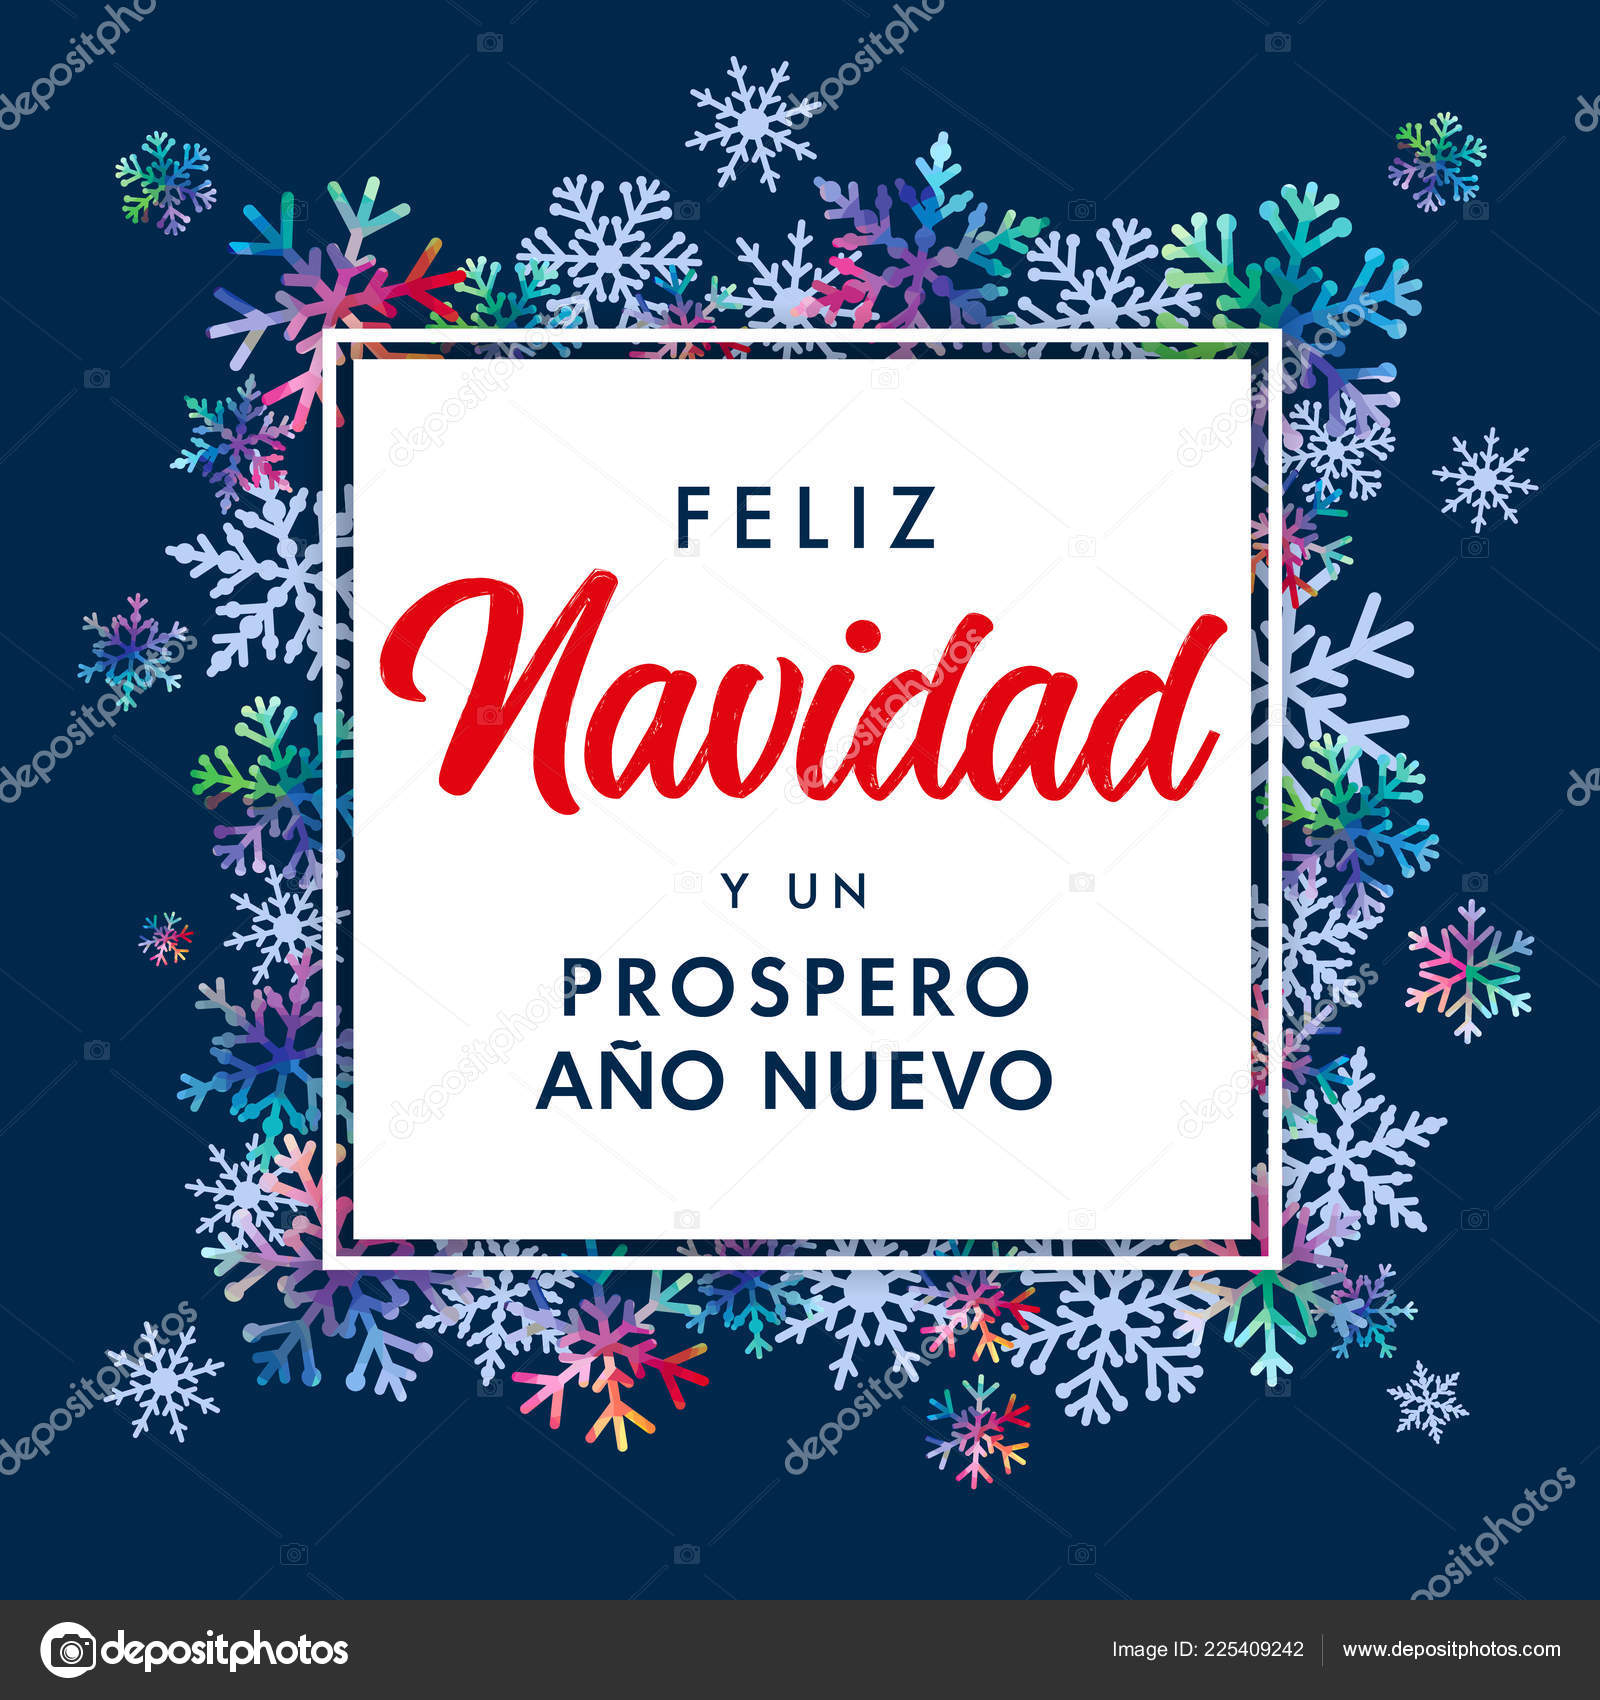 Feliz Navidad Spanish Text Prospero Ano Nuevo Translate Merry ...